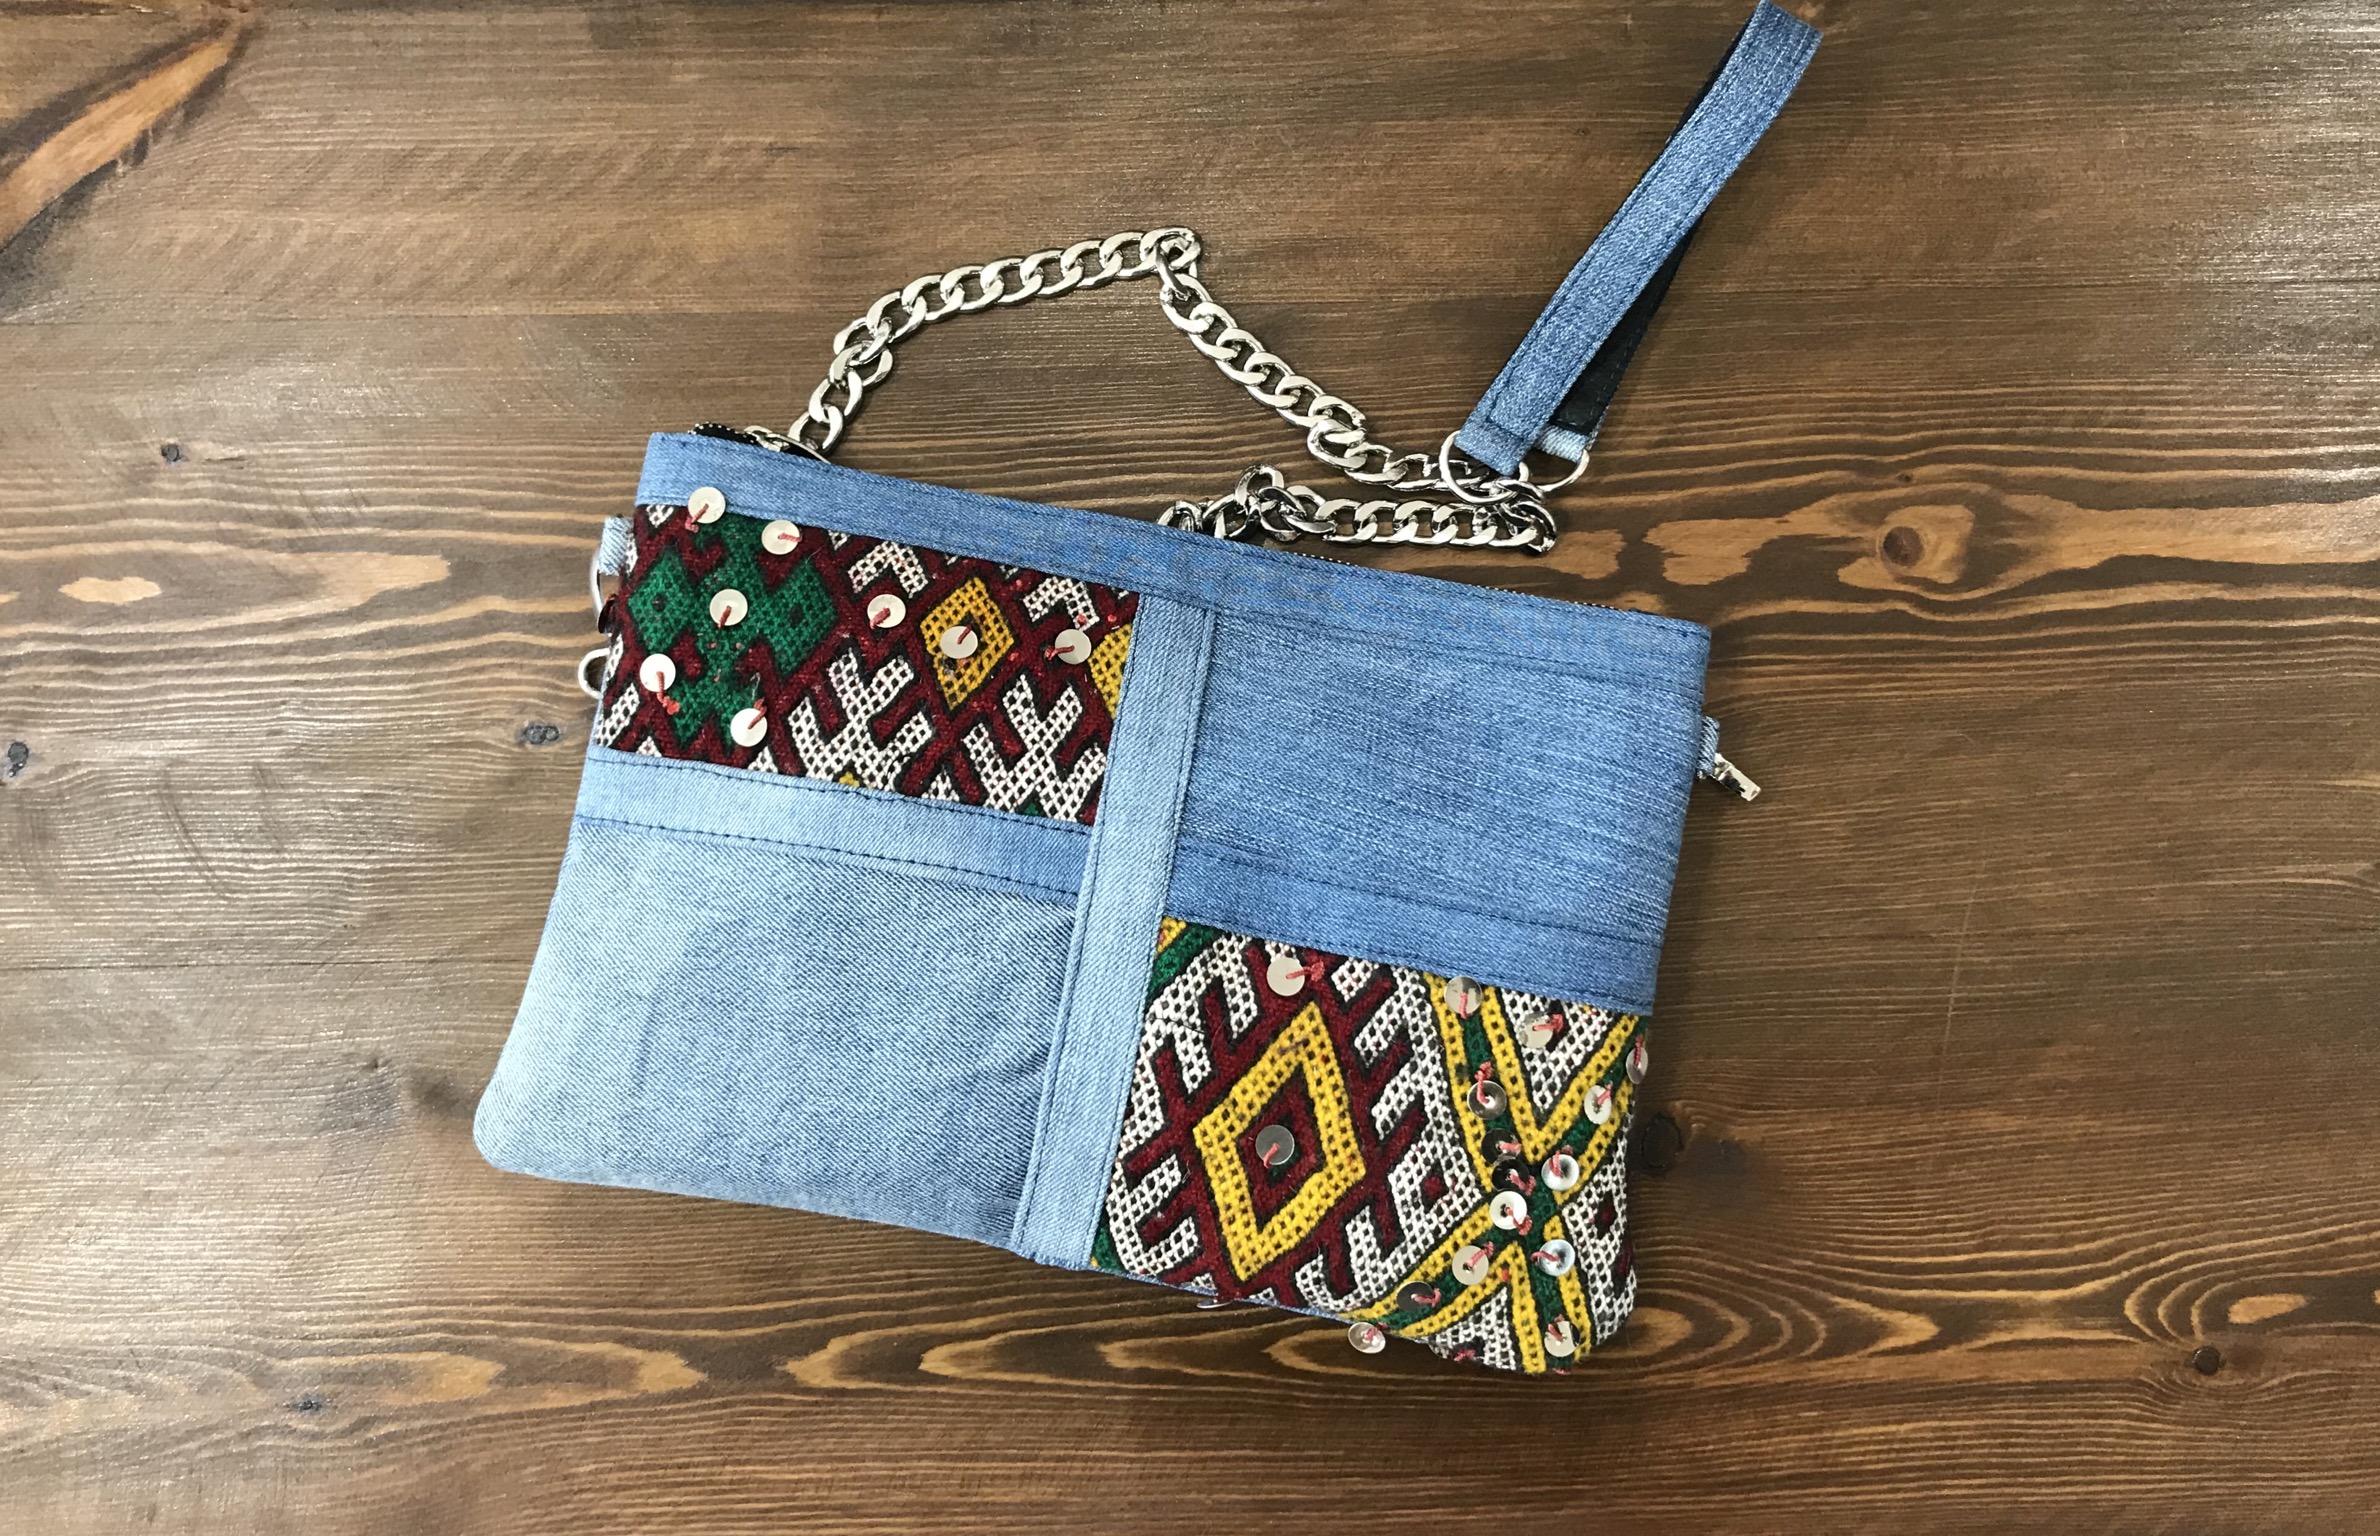 Bag purse jeans kilim & mozona